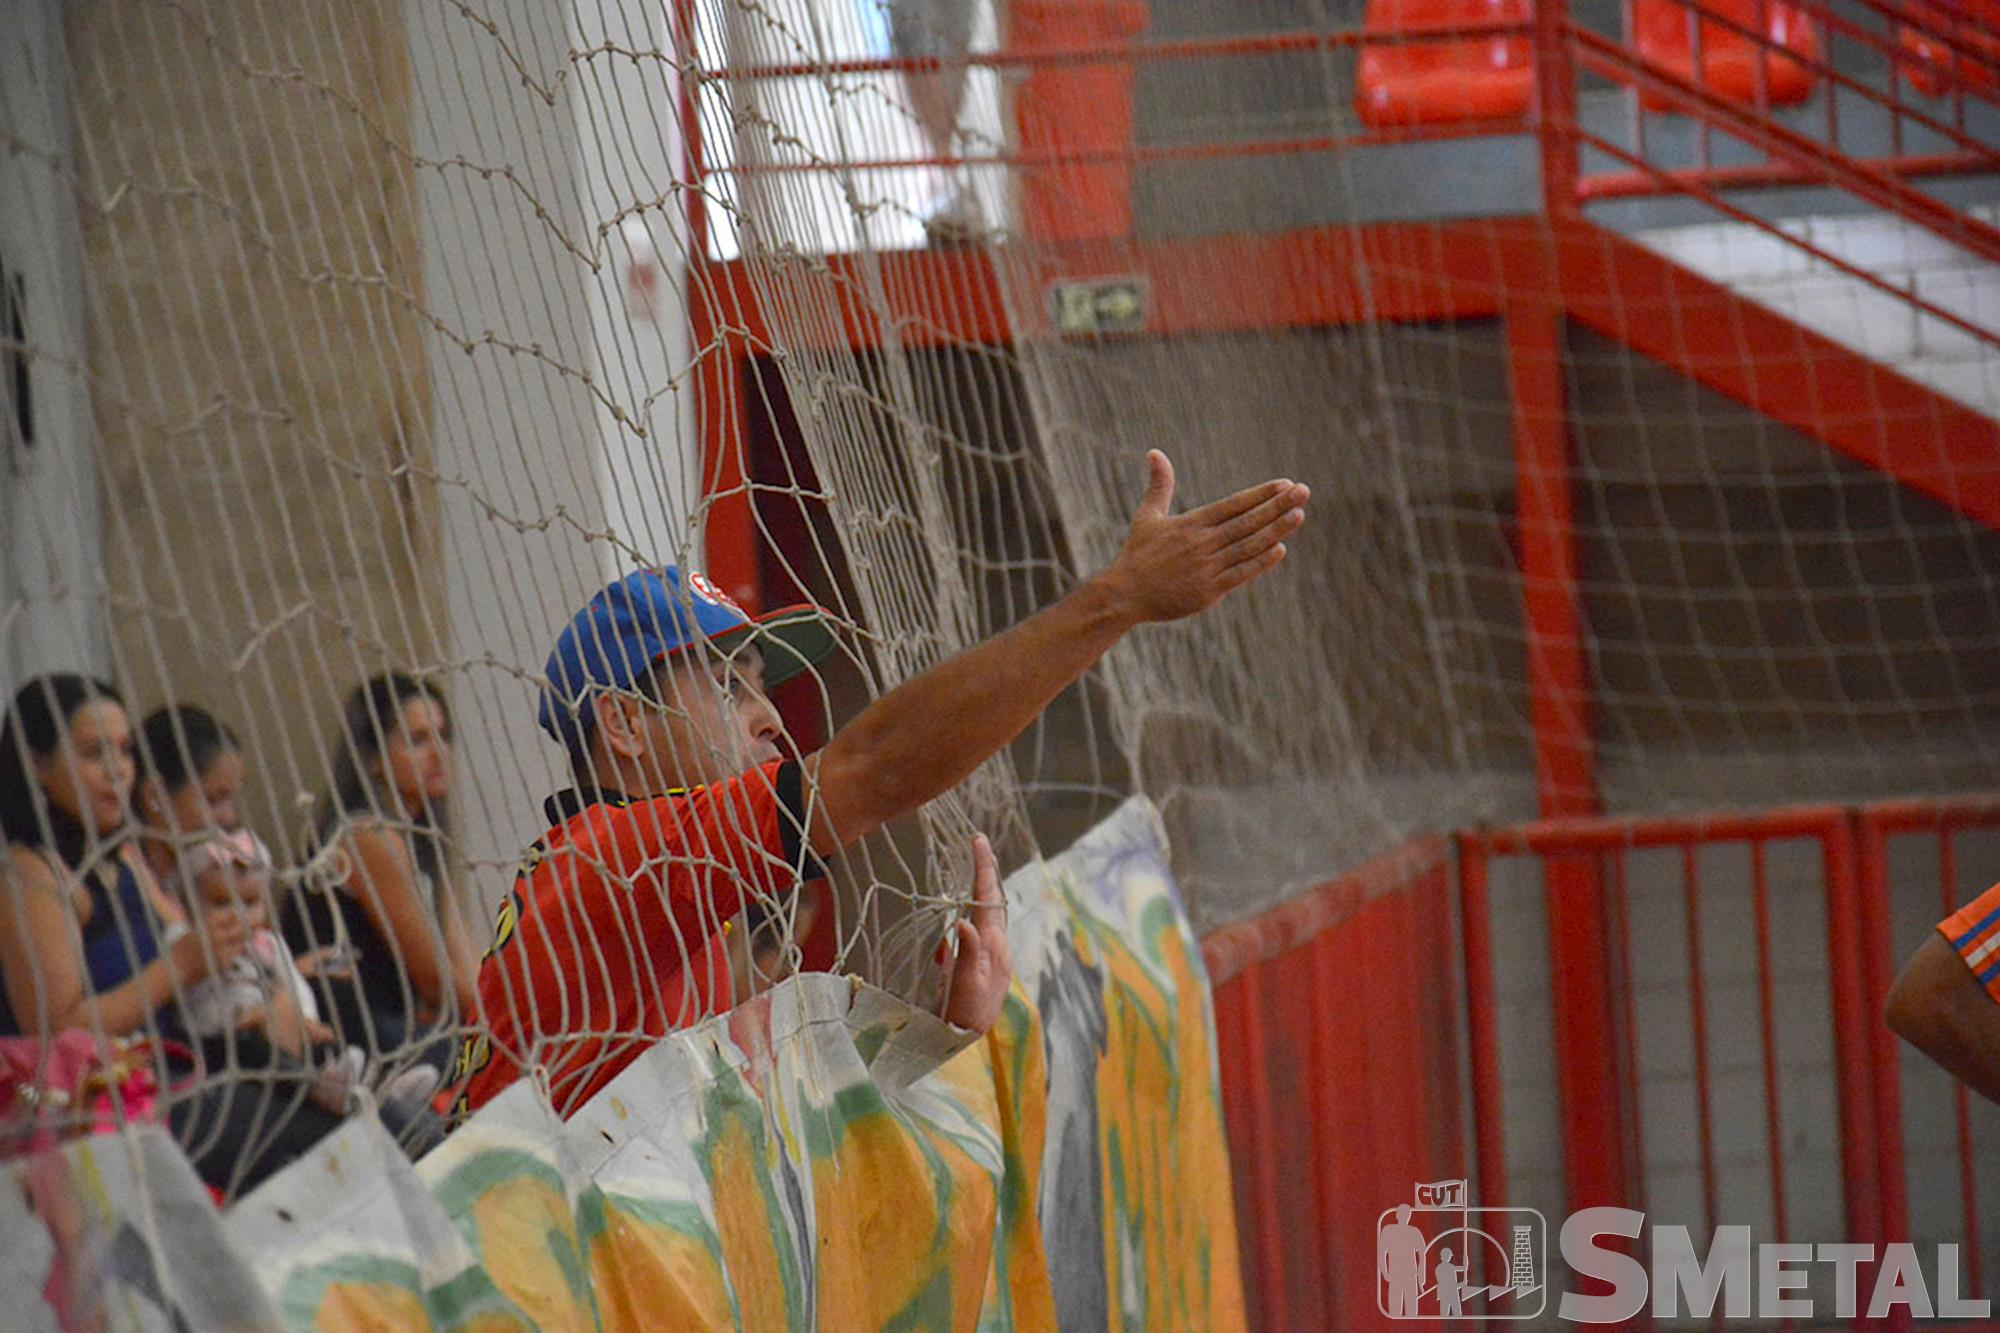 Final da 12ª Taça Papagaio do SMetal, Final da 12ª Taça Papagaio do SMetal